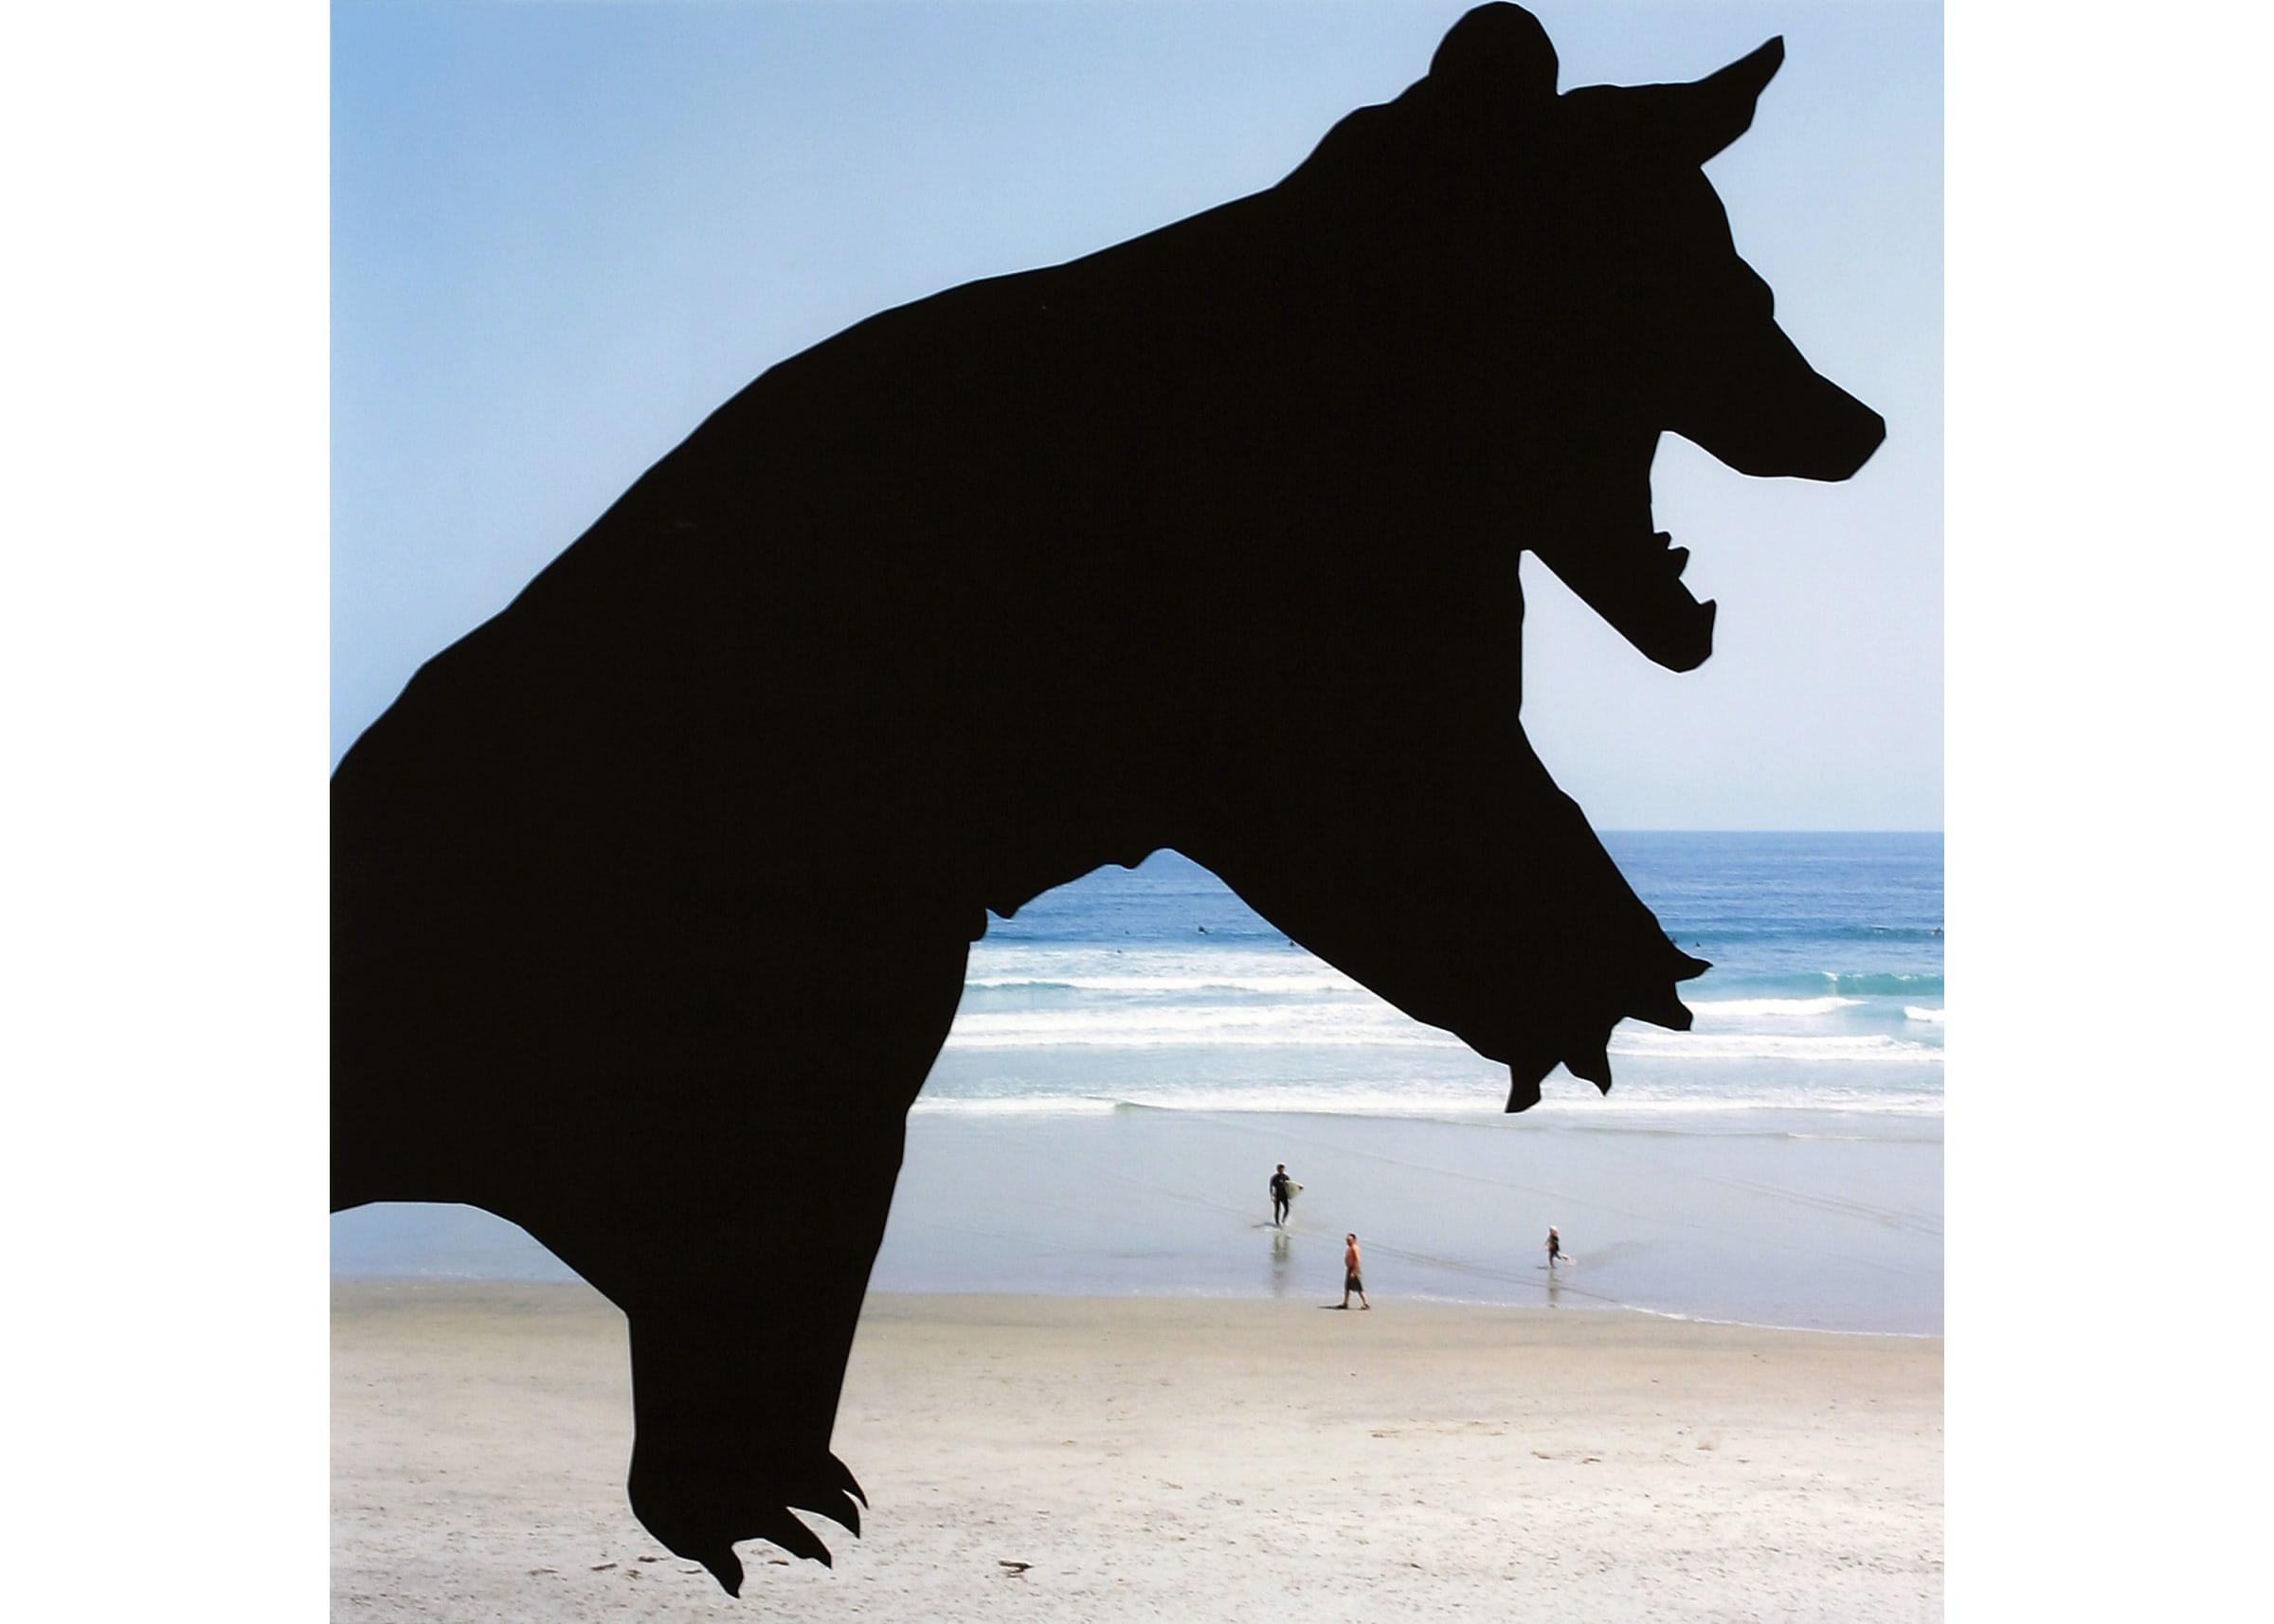 Cartoonish bear silhouette collaged over beach scene